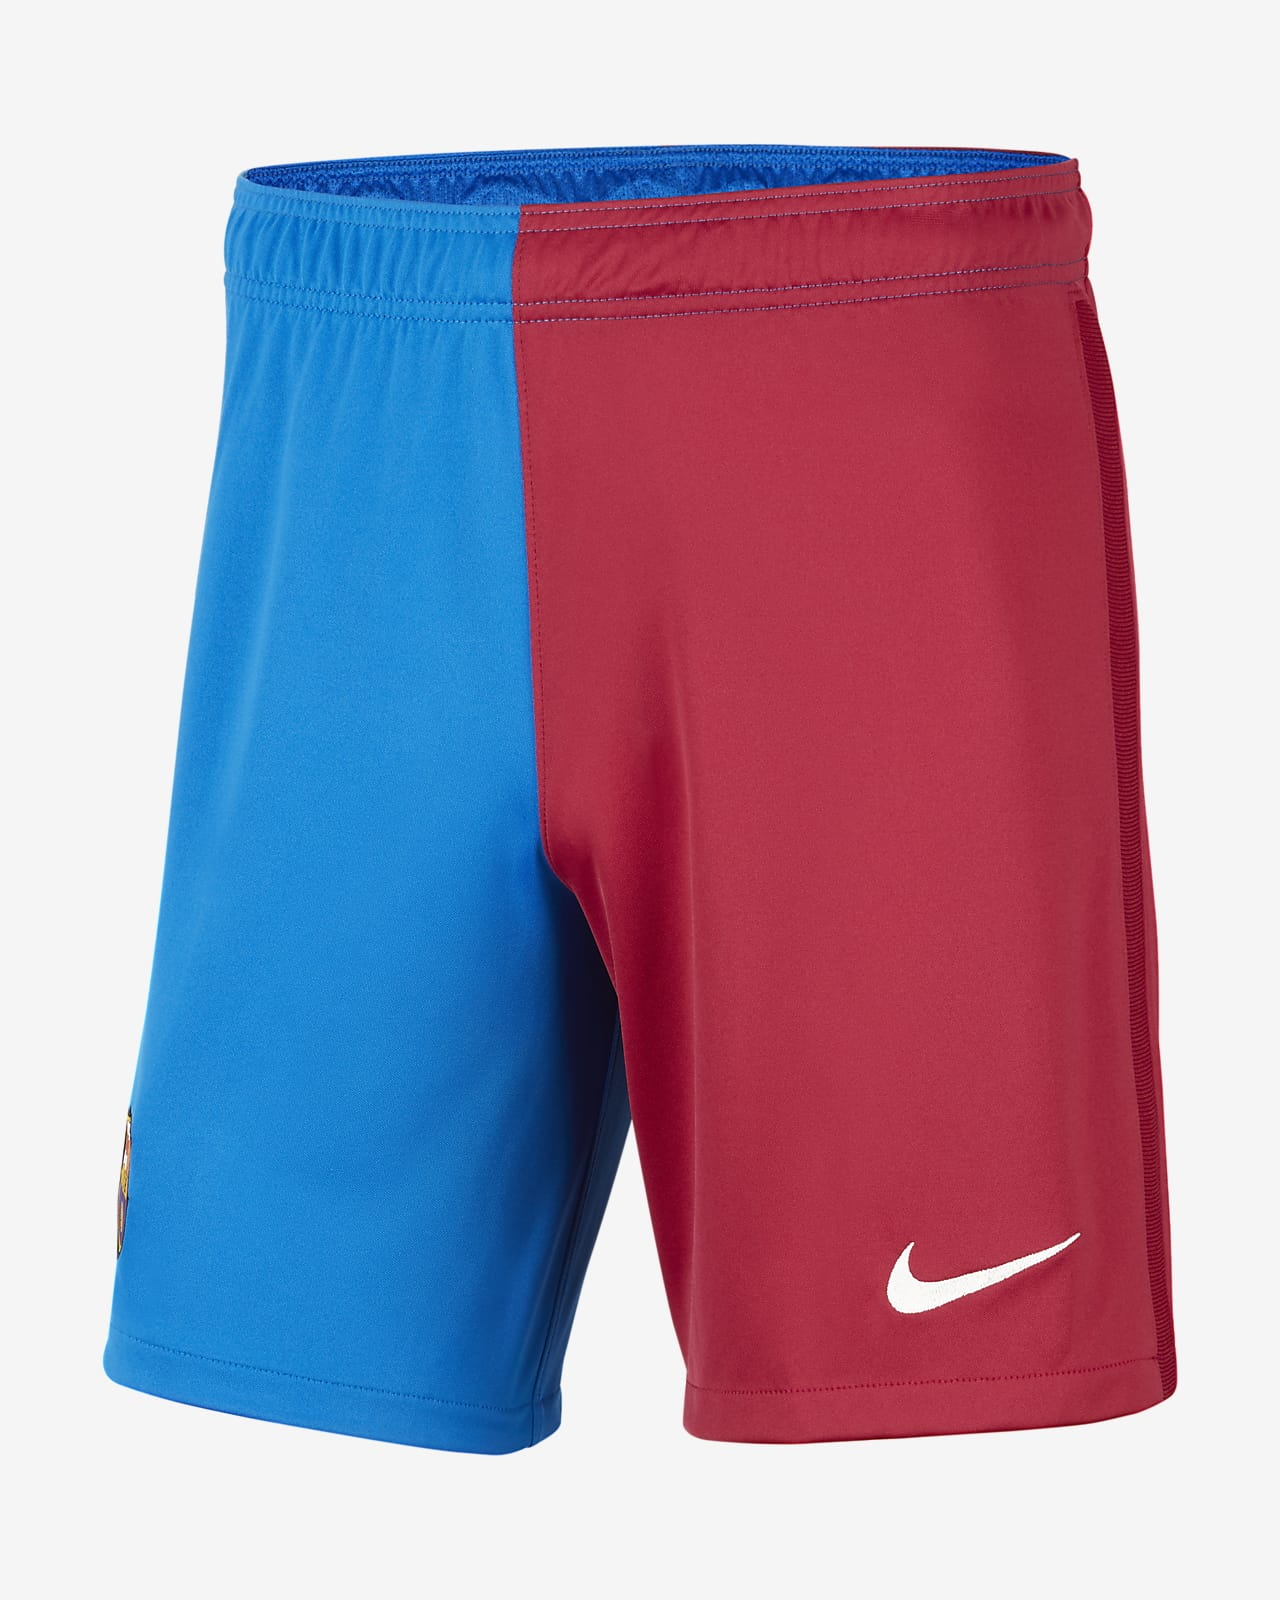 F.C. Barcelona 2021/22 Stadium Home/Away Men's Football Shorts